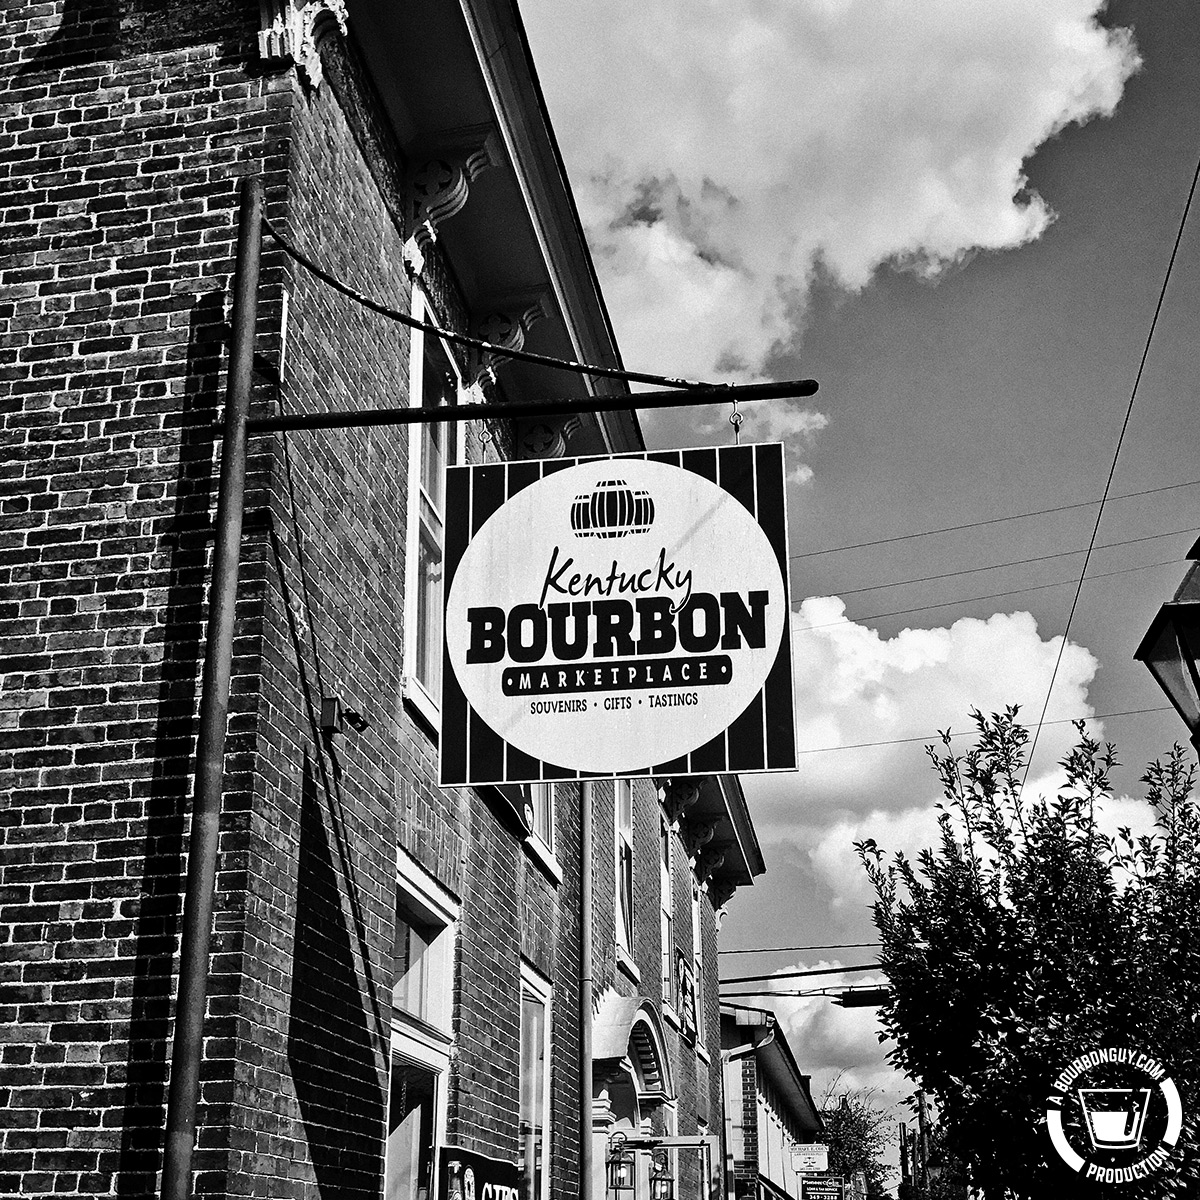 Kentucky Bourbon Marketplace